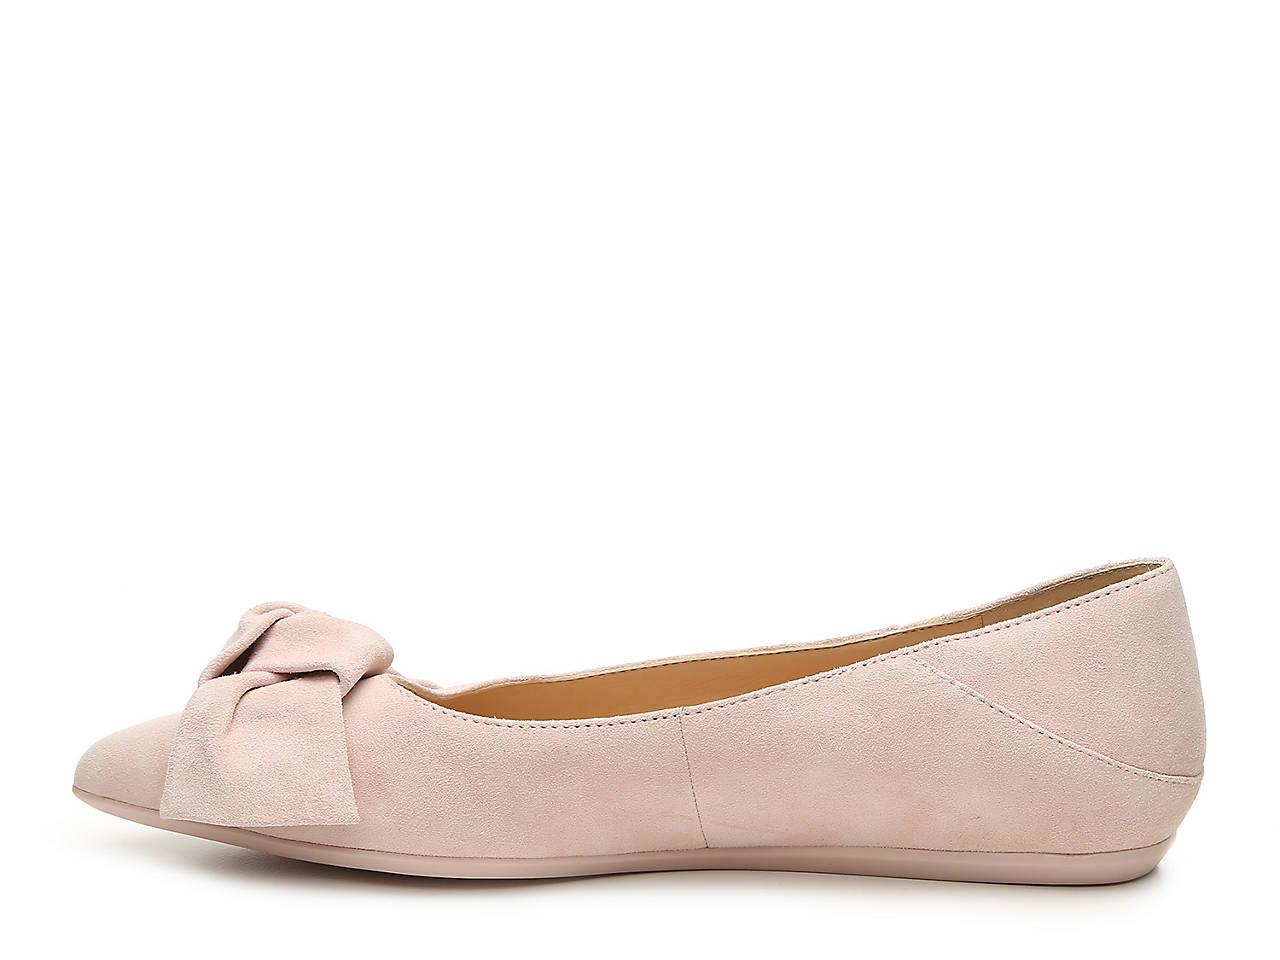 76930548f6f Franco Sarto Abilene Flat Women s Shoes